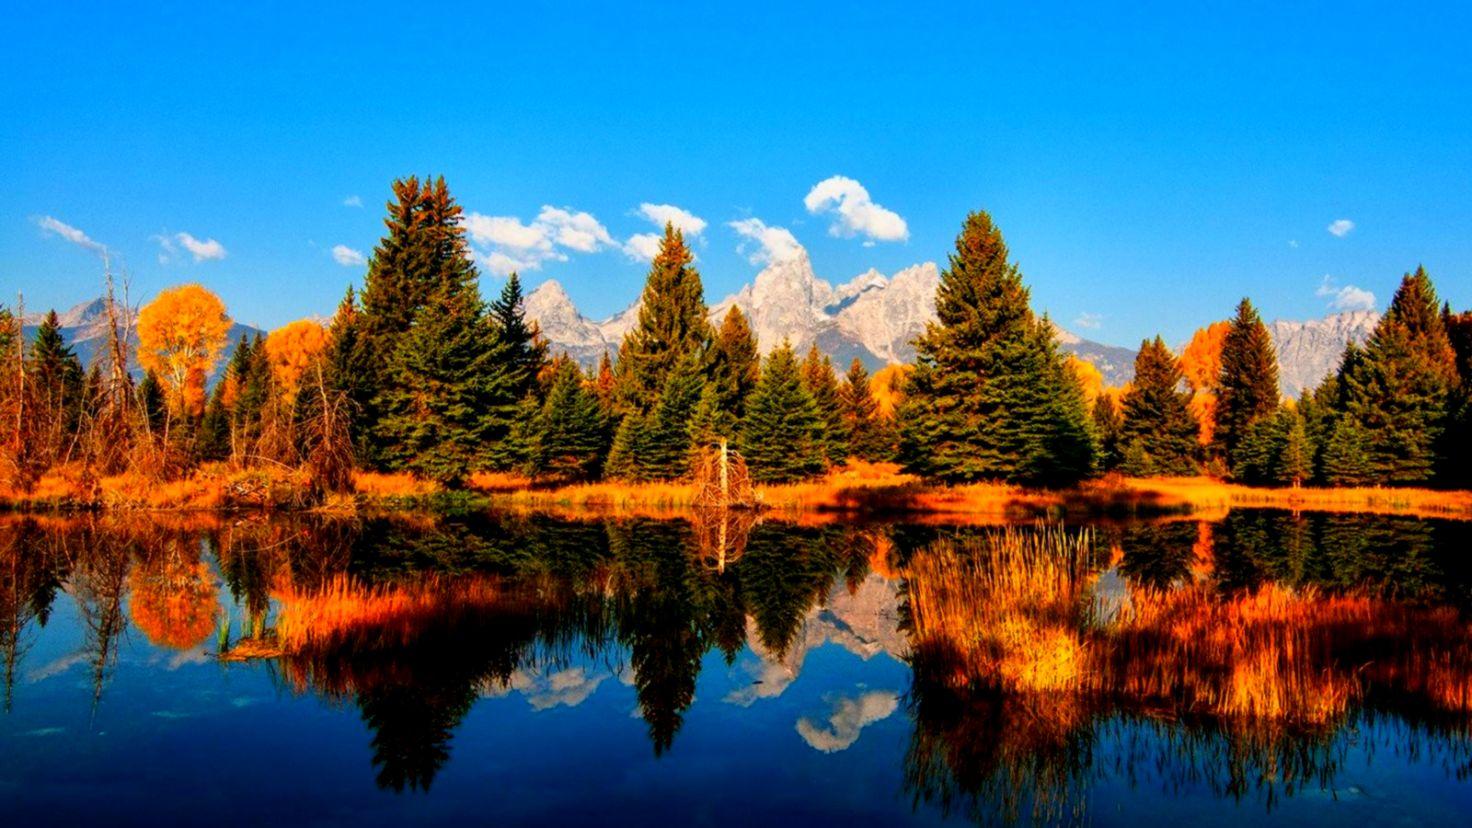 Fall Mountain Wallpaper Hd Link Wallpapers